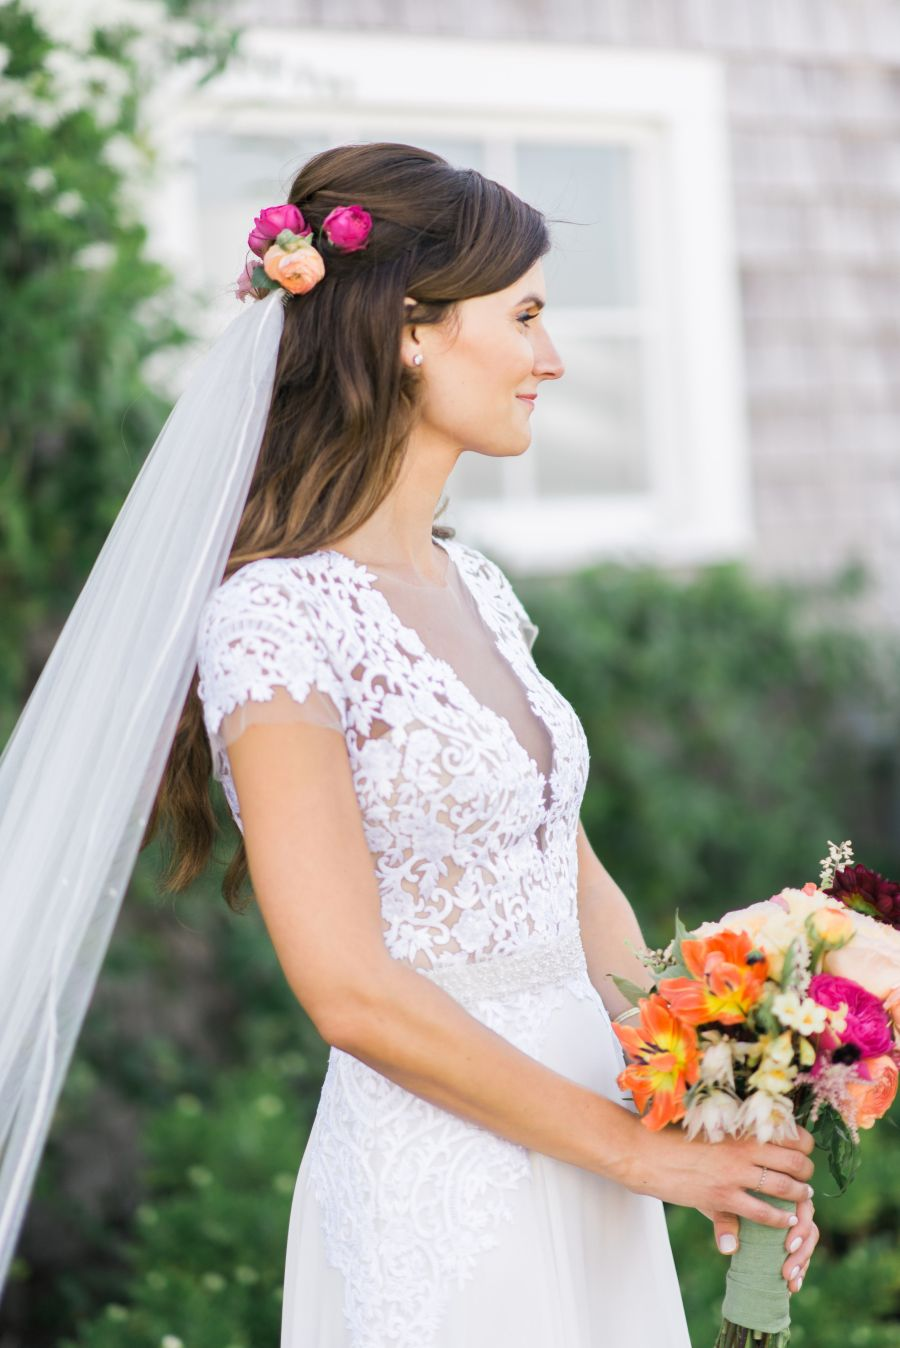 Blogger bride jessye of city tonicus colorful diy wedding stylists